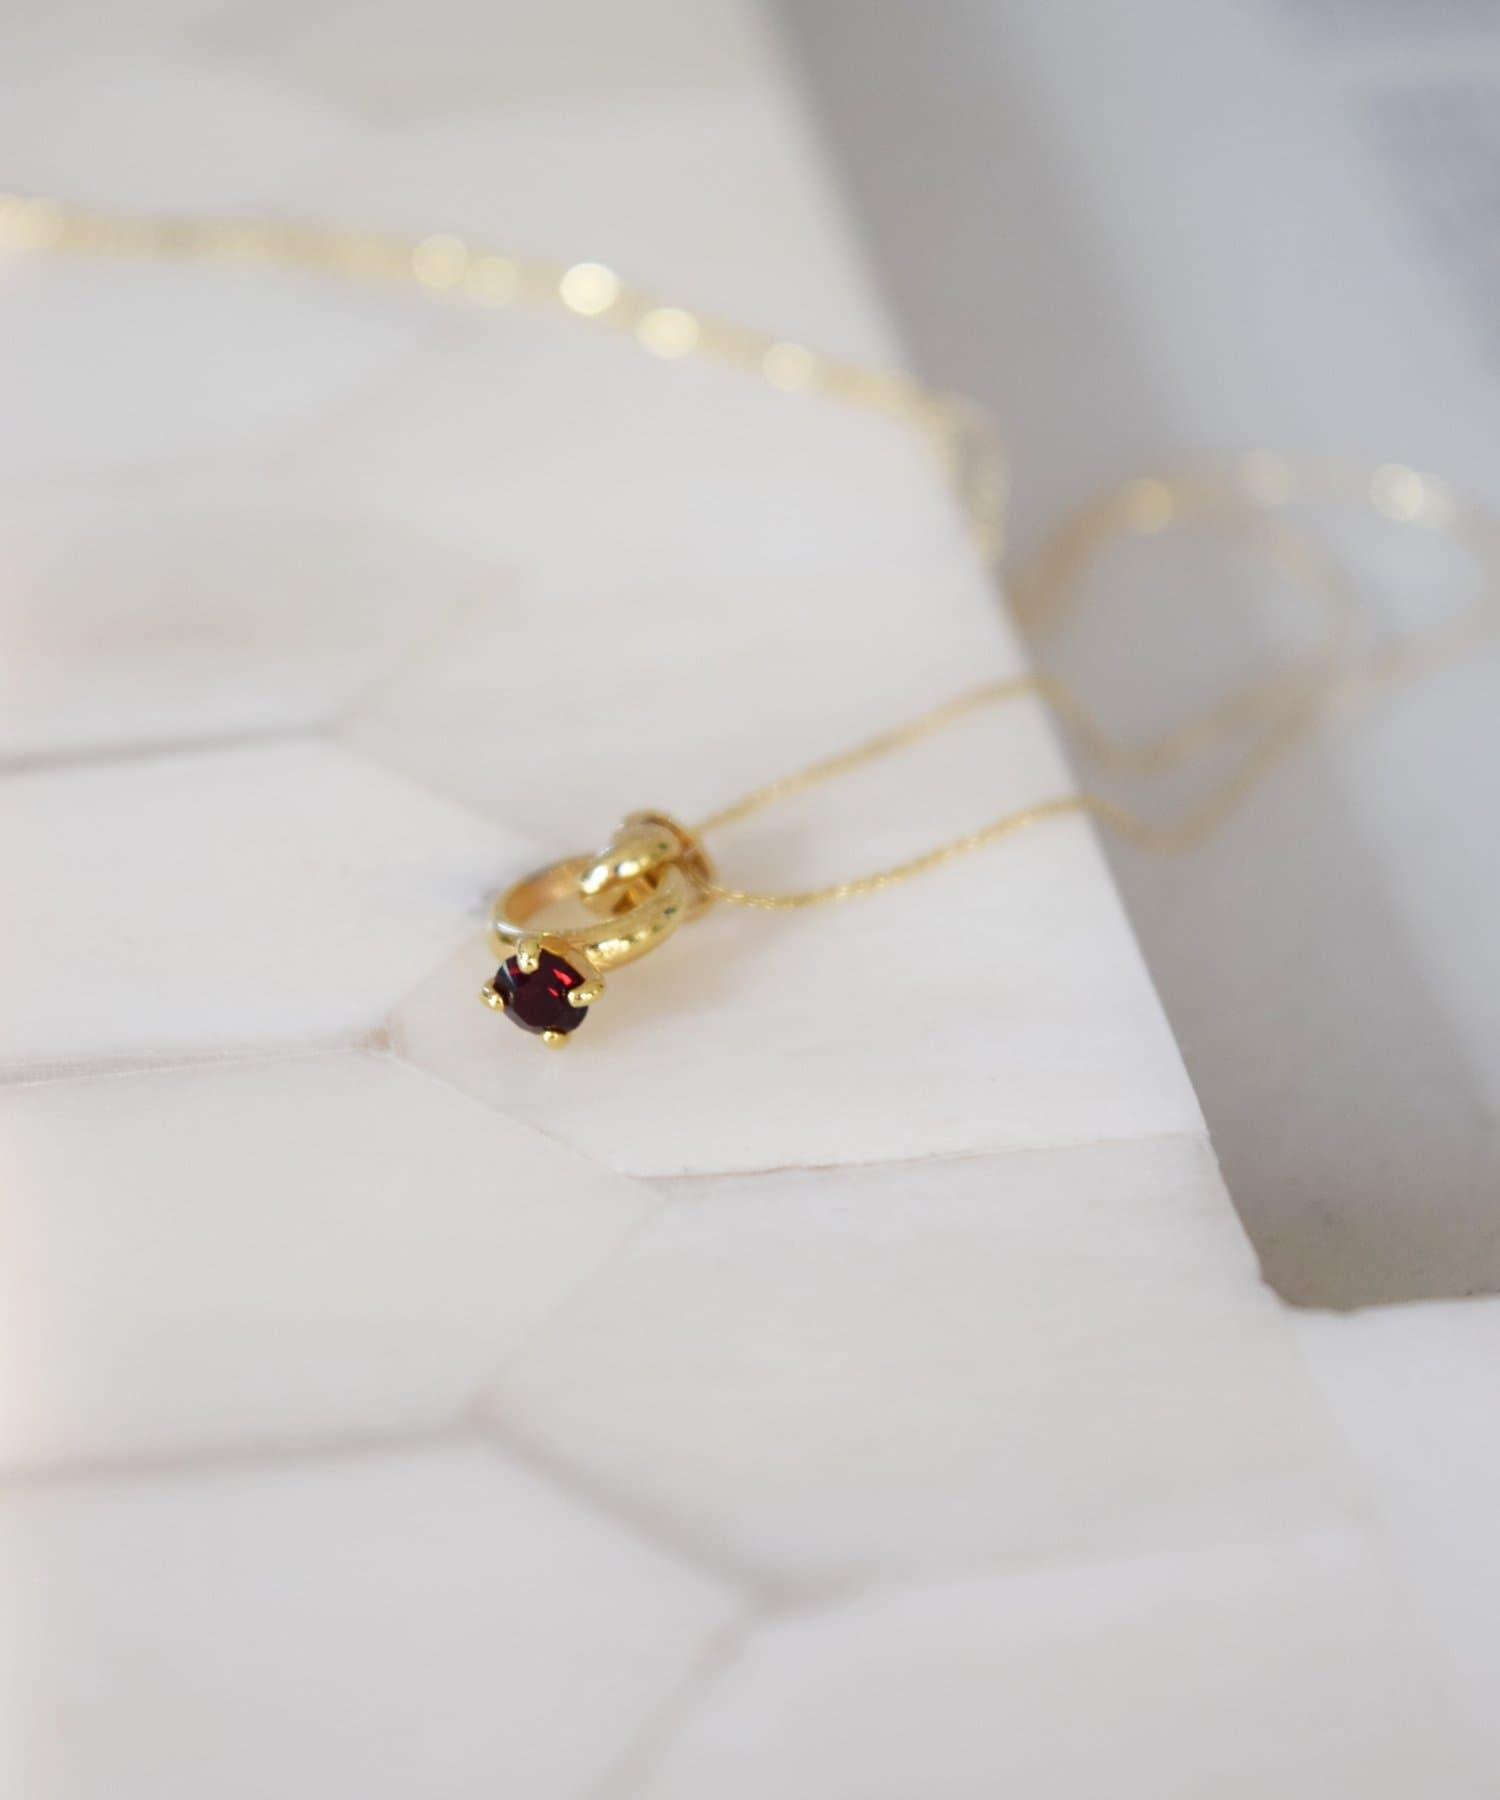 BIRTHDAY BAR(バースデイバー) レディース Birthstone Petit Ring Necklace 誕生石ネックレス レッド